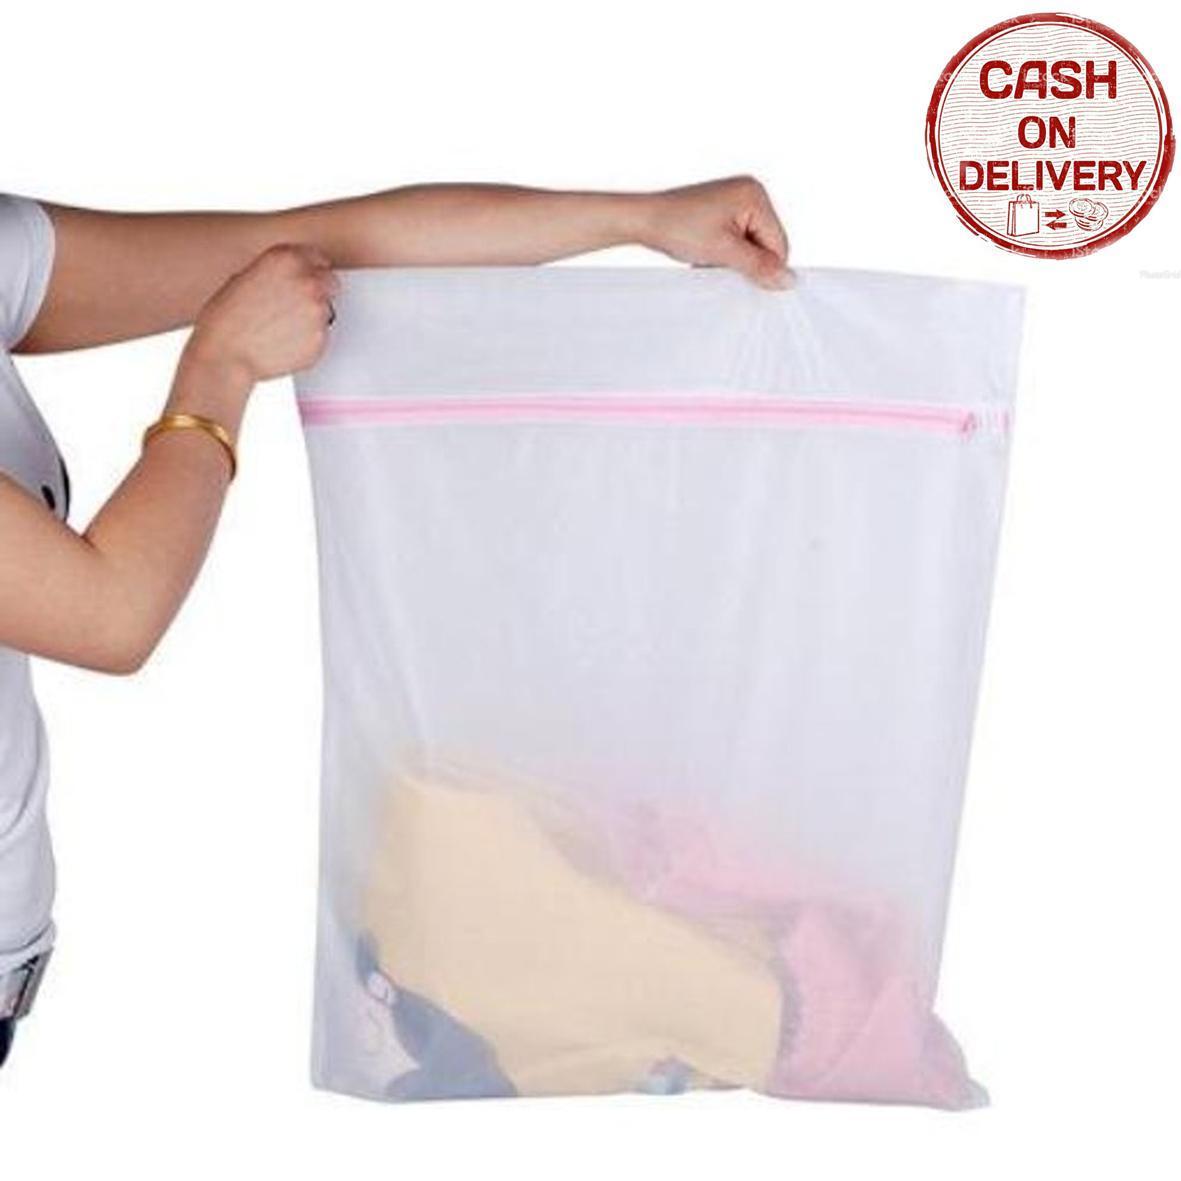 Kelebihan Kantong Resleting Baju Kotor Tas Laundry Bag Jaring 30 Keranjang Tempat Pakaian Lipat Bags Bh Hamper Kado Unik Bra Cucian